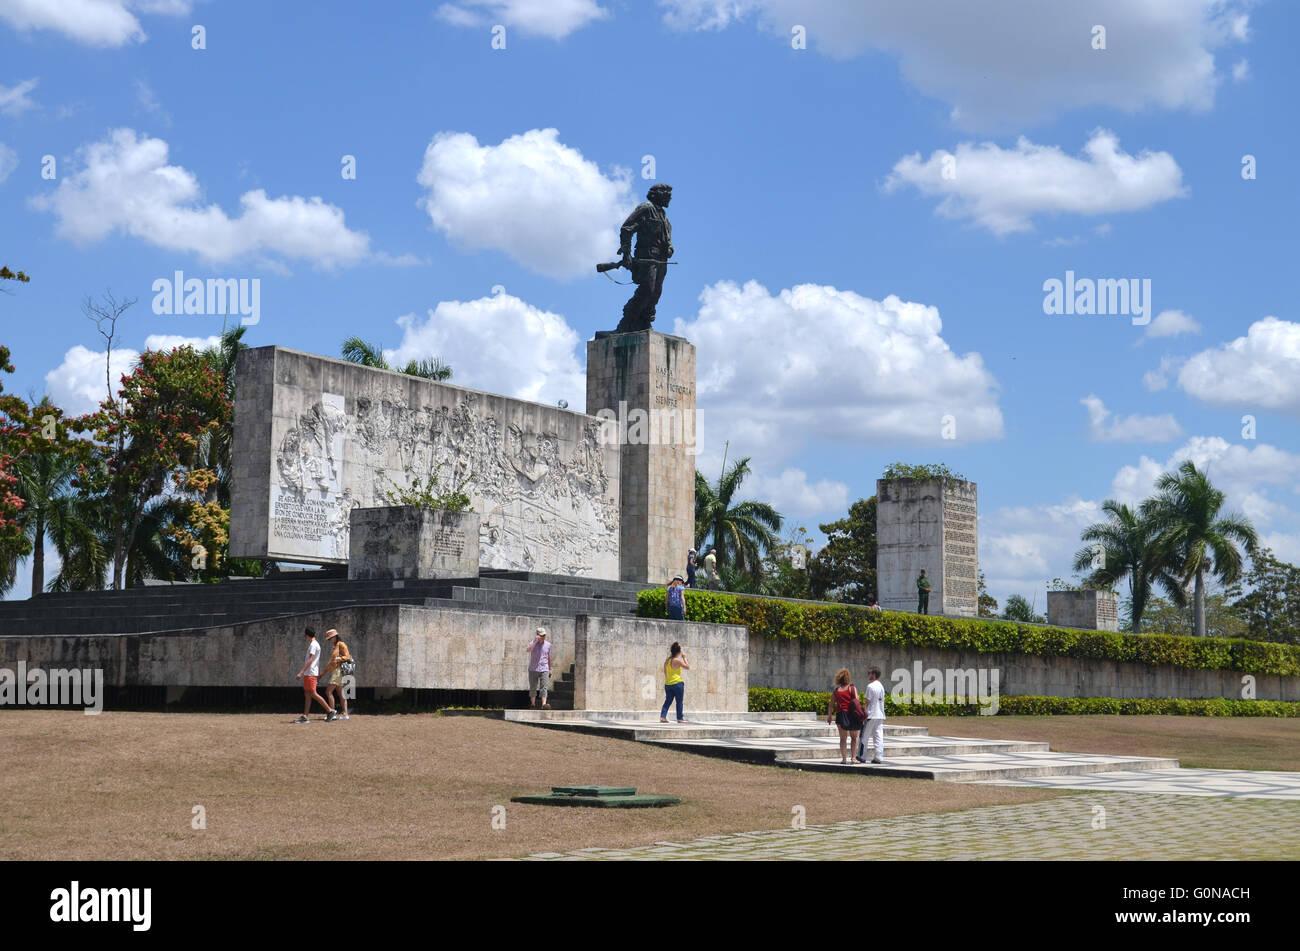 Complejo monumentale Ernesto Che Guevara, letzte Ruhestätte von Che Guevara, Santa Clara Kuba 2016 Stockbild